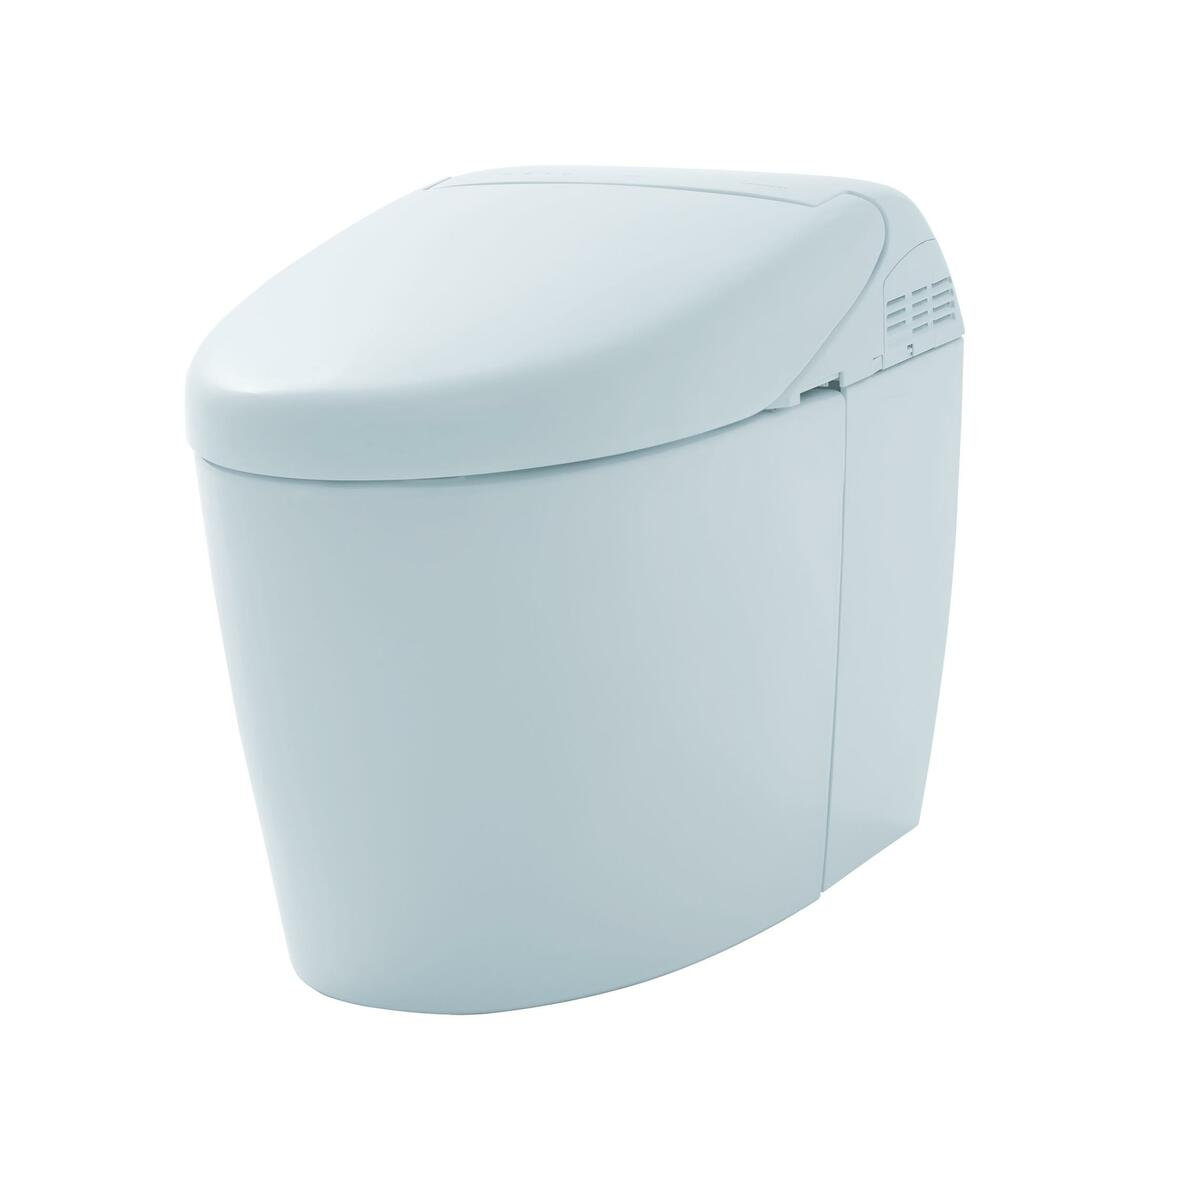 TOTO ··一体形便器 ··RH1  自動洗浄 ·開閉 壁排水:CES9768PCR  #NW1 (CS989BP  + TCF9768CR + ··同梱)(注3週)∴ ·